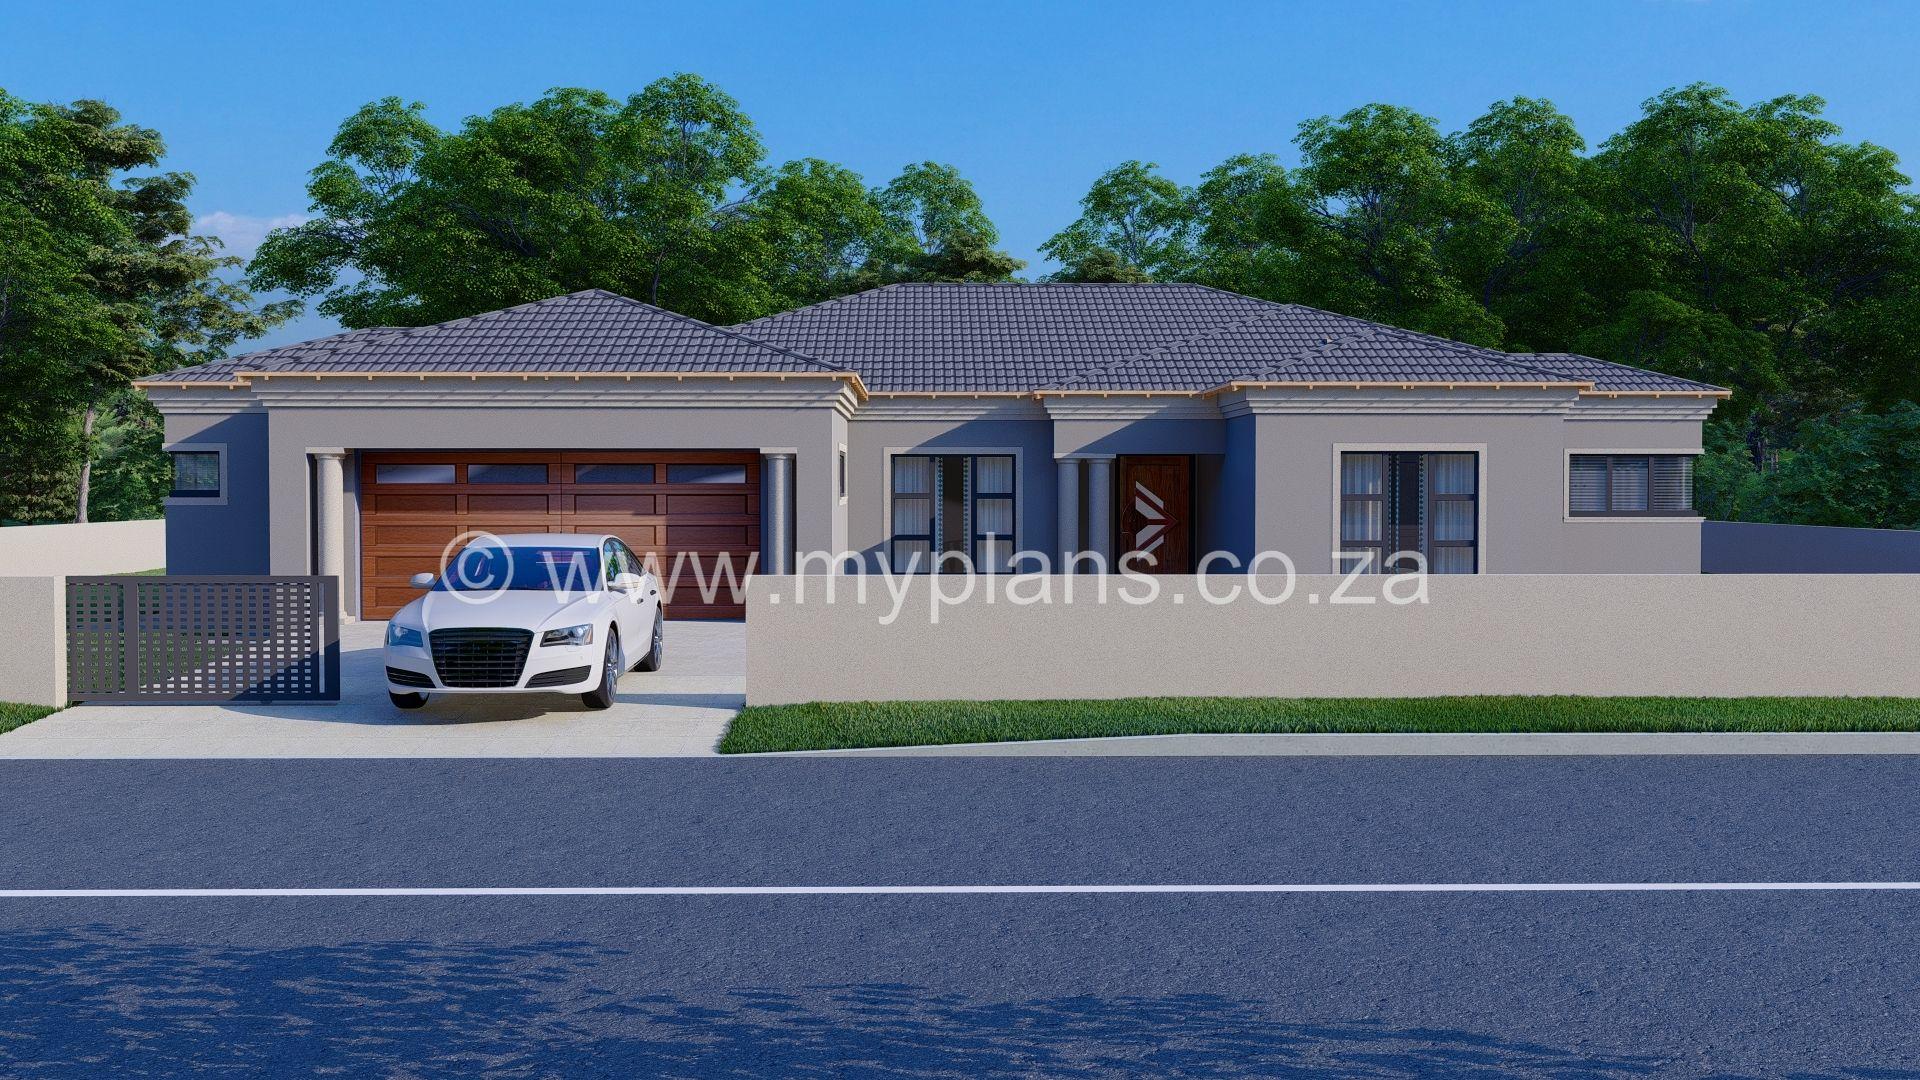 3 Bedroom House Plan Mlb 069s In 2020 Bedroom House Plans House Plans South Africa Family House Plans